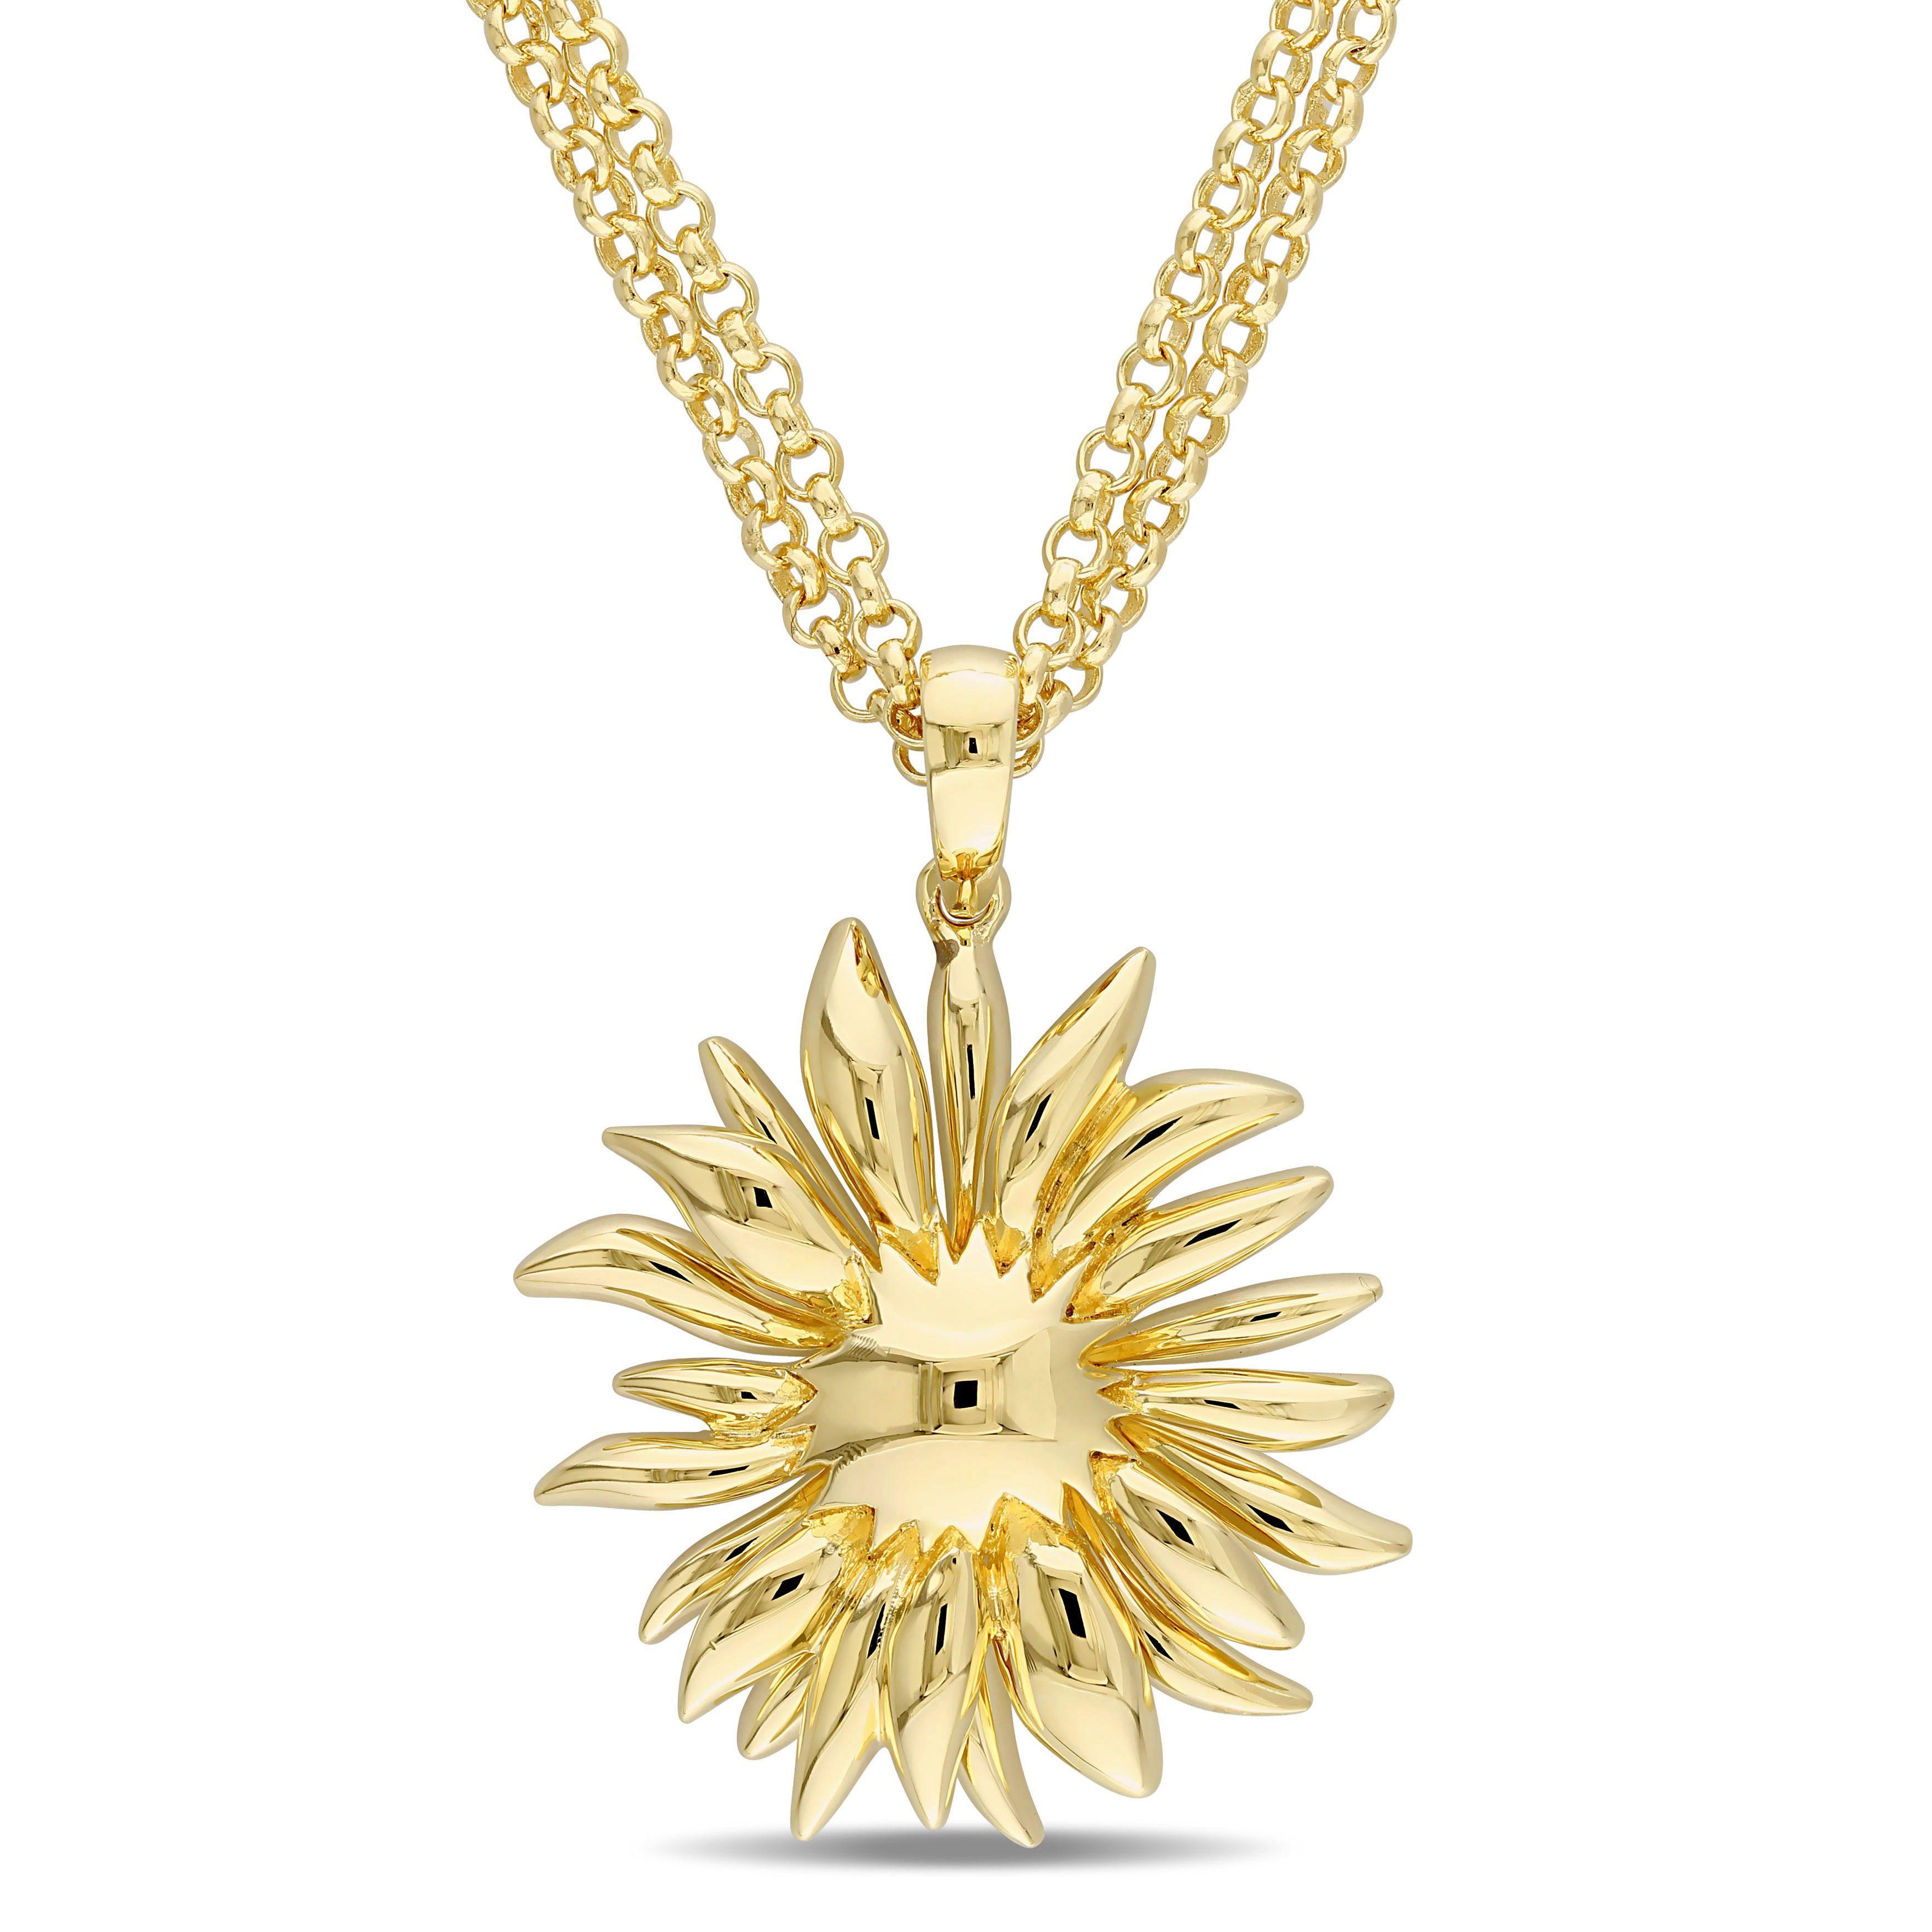 Versace 19.69 Abbigliamento Sportivo SRL Logo Flower Necklace in 18K Gold Plated Sterling Silver, Women's